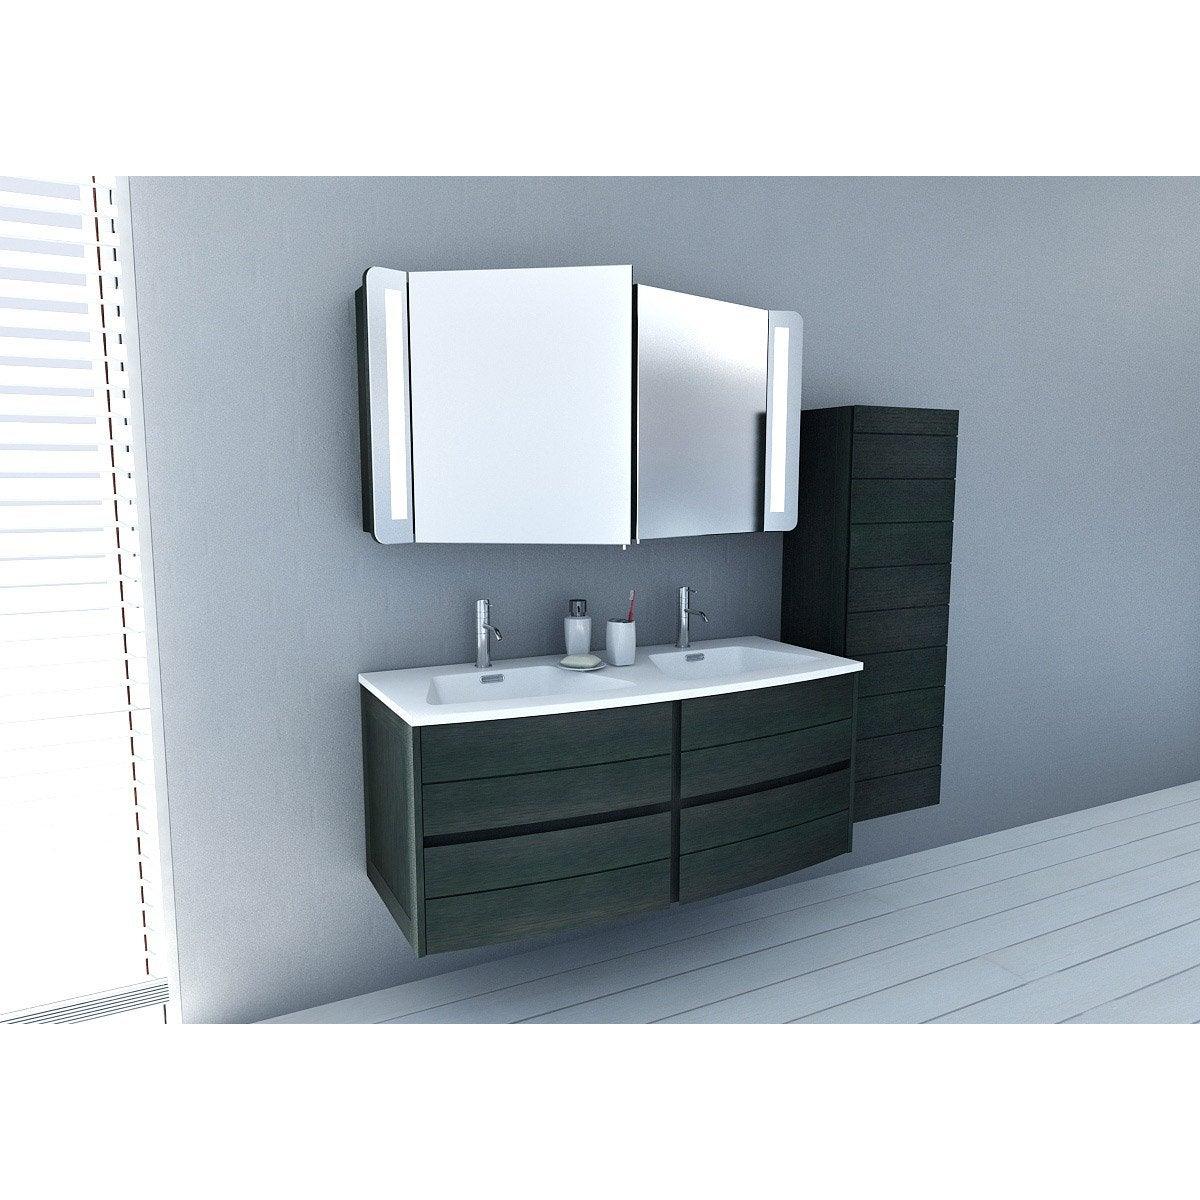 Meuble de salle de bains plus de 120 noir fairway for Meuble bureau leroy merlin